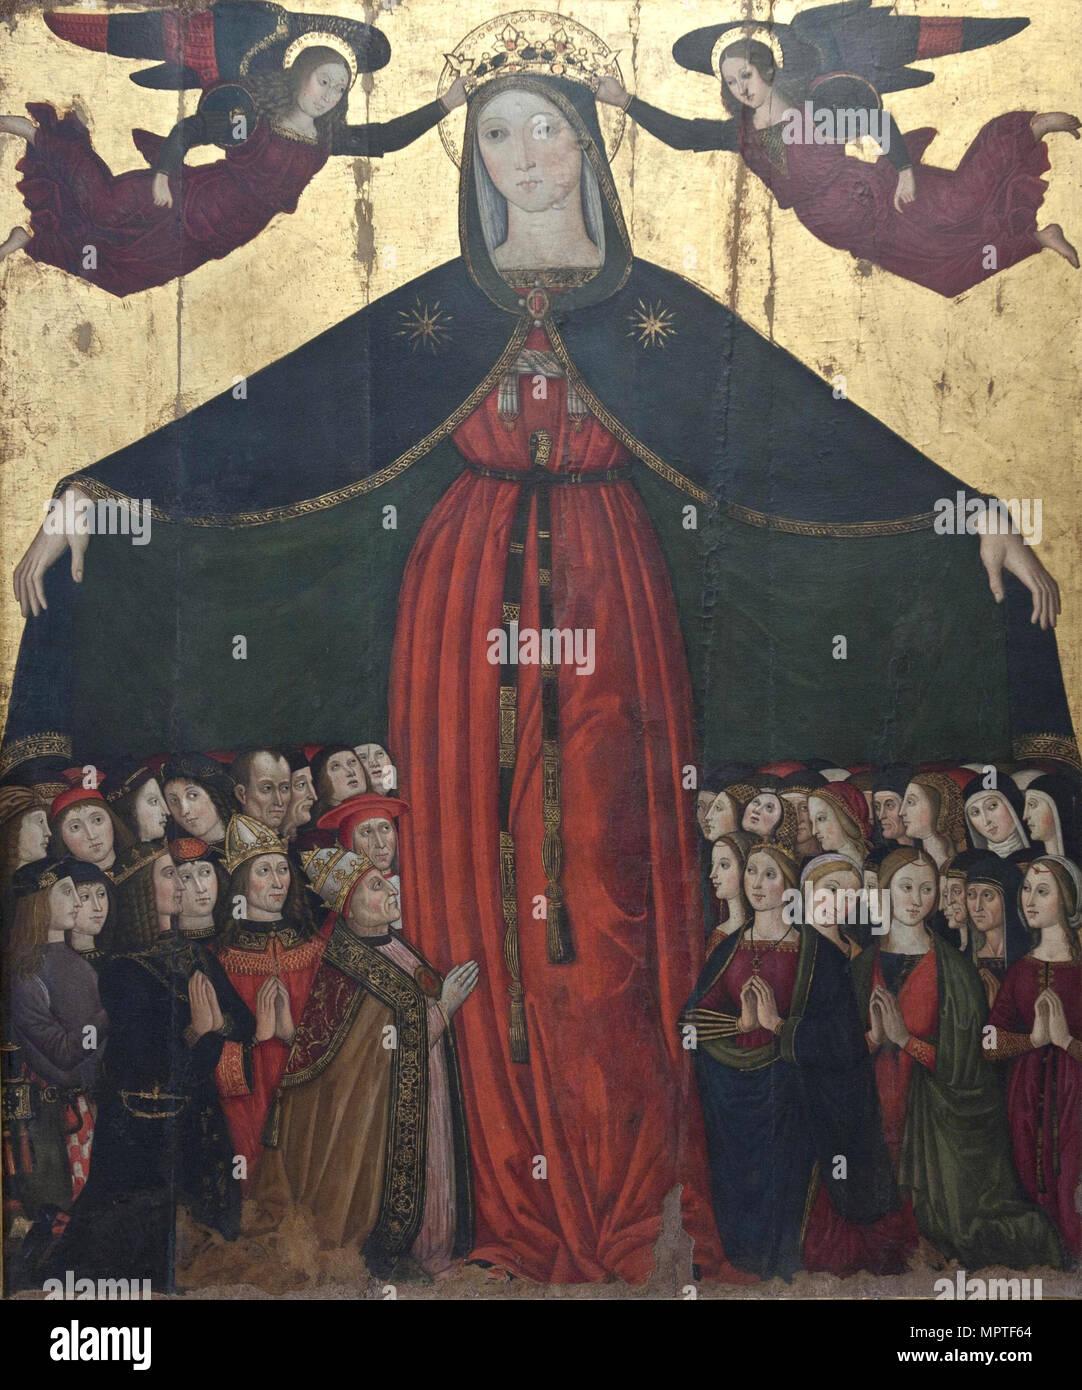 Madonna della Misericordia (Madonna of Mercy), c. 1500. - Stock Image